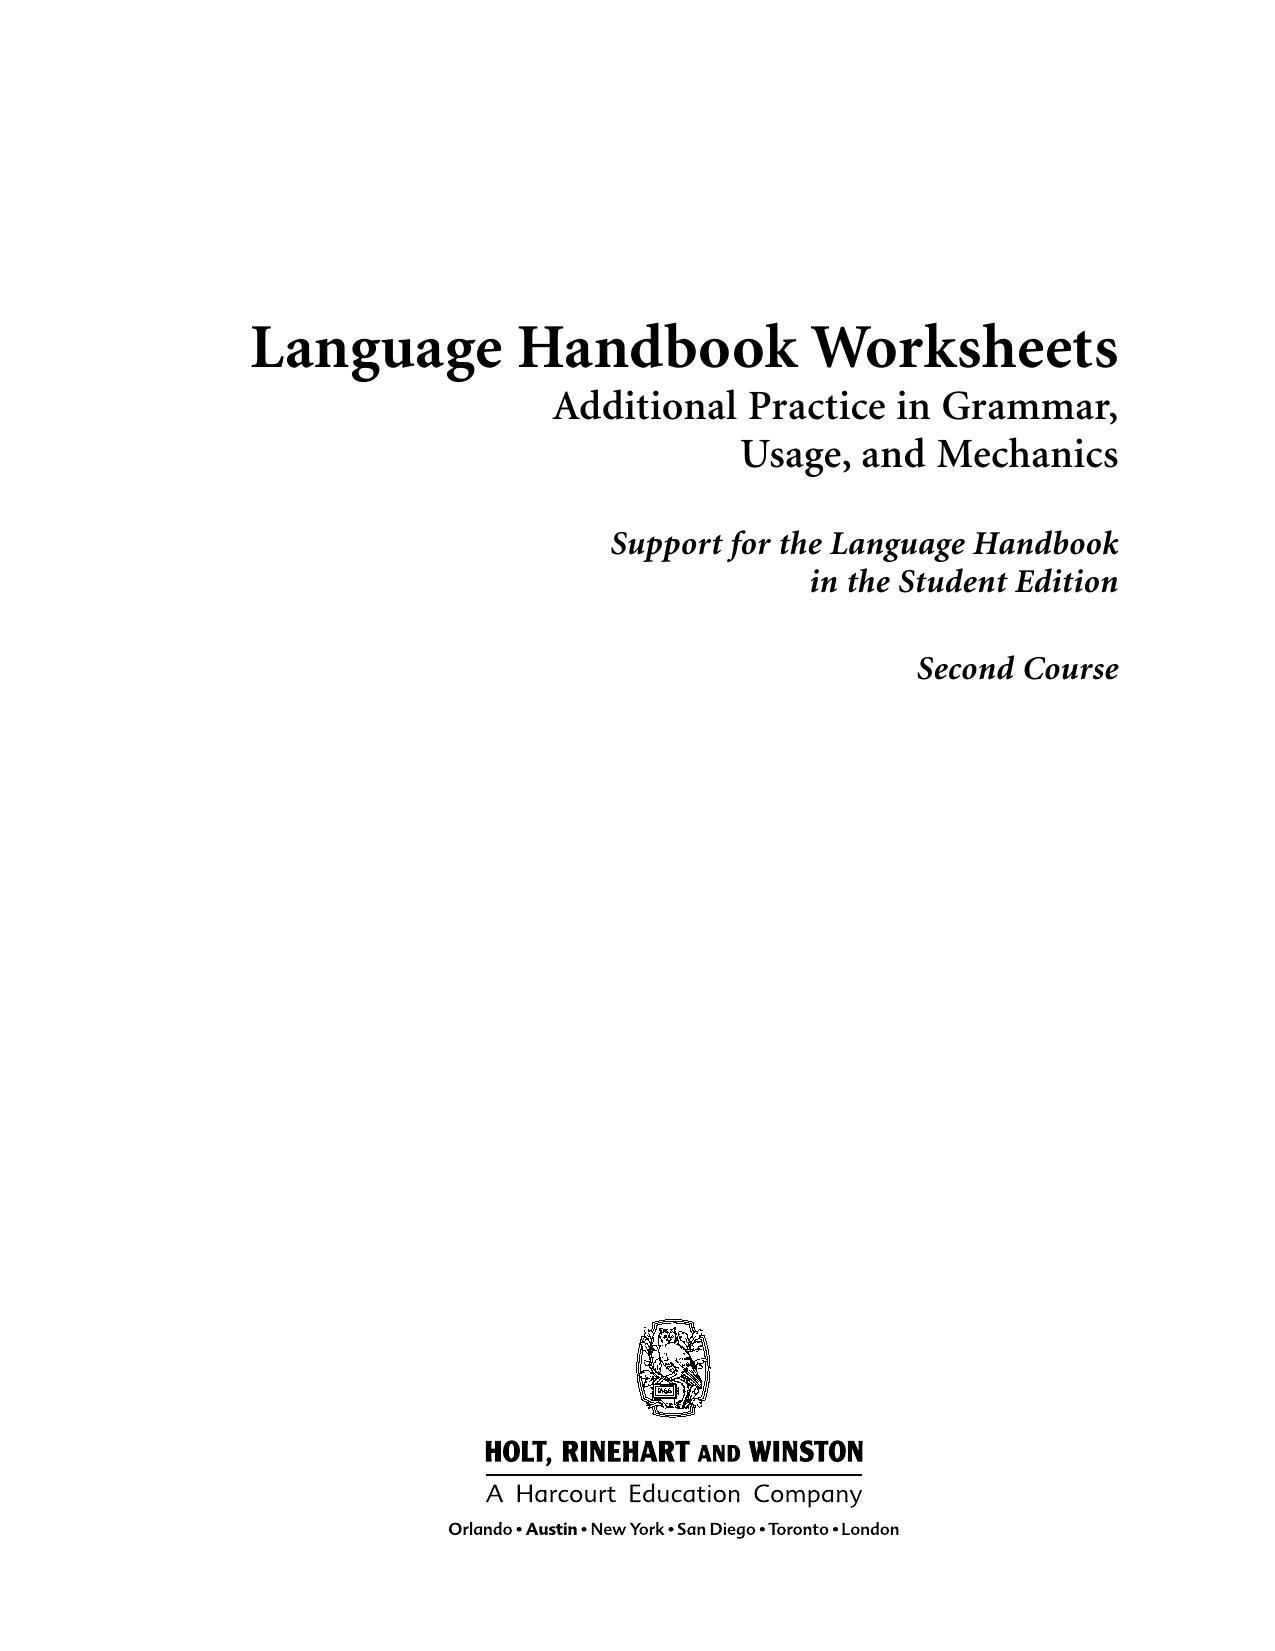 Worksheets Language Handbook Worksheets Answer Key Online language handbook worksheets